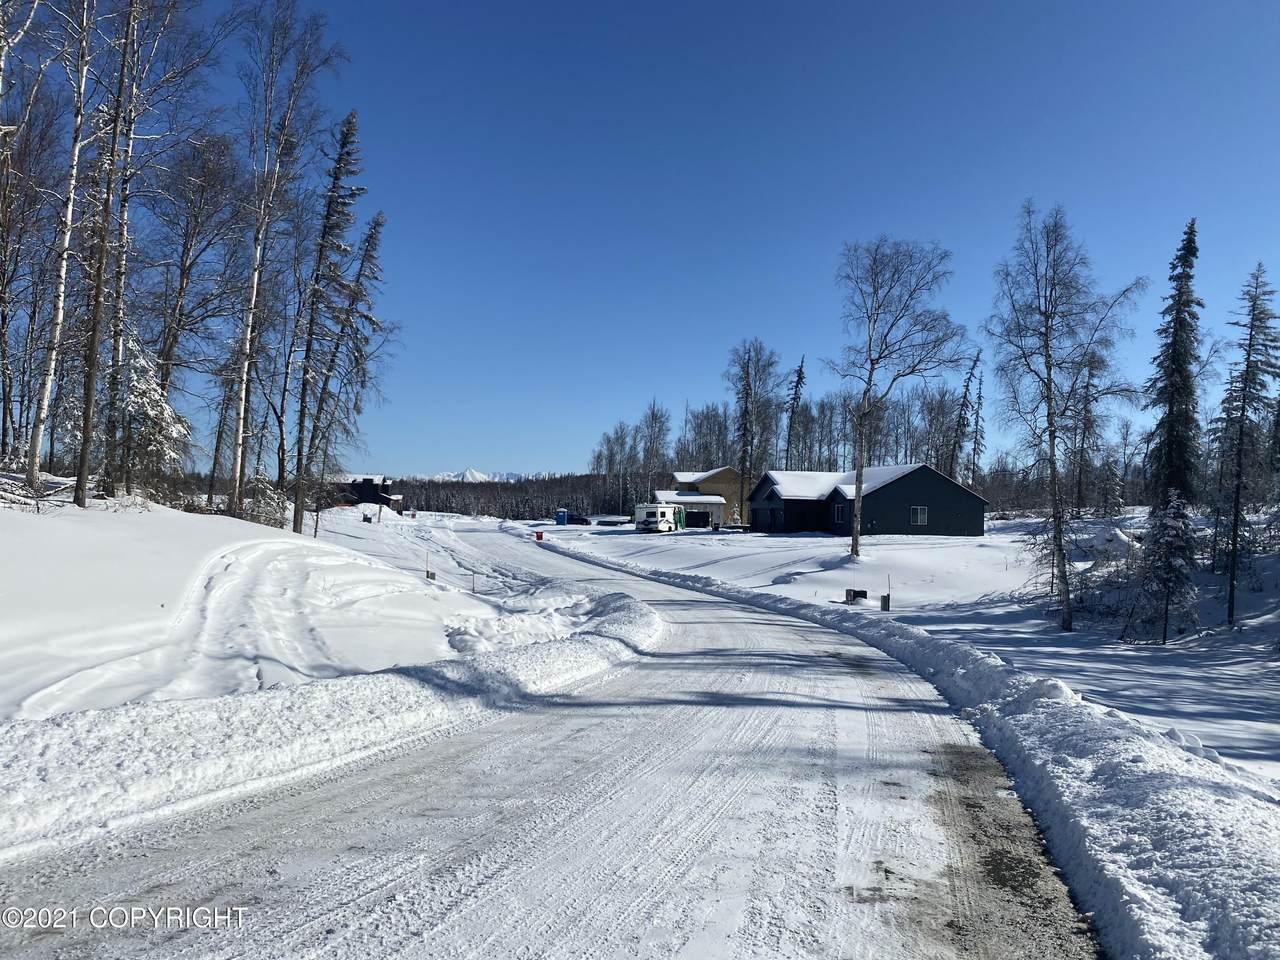 https://bt-photos.global.ssl.fastly.net/alaska/1280_boomver_1_21-3902-2.jpg